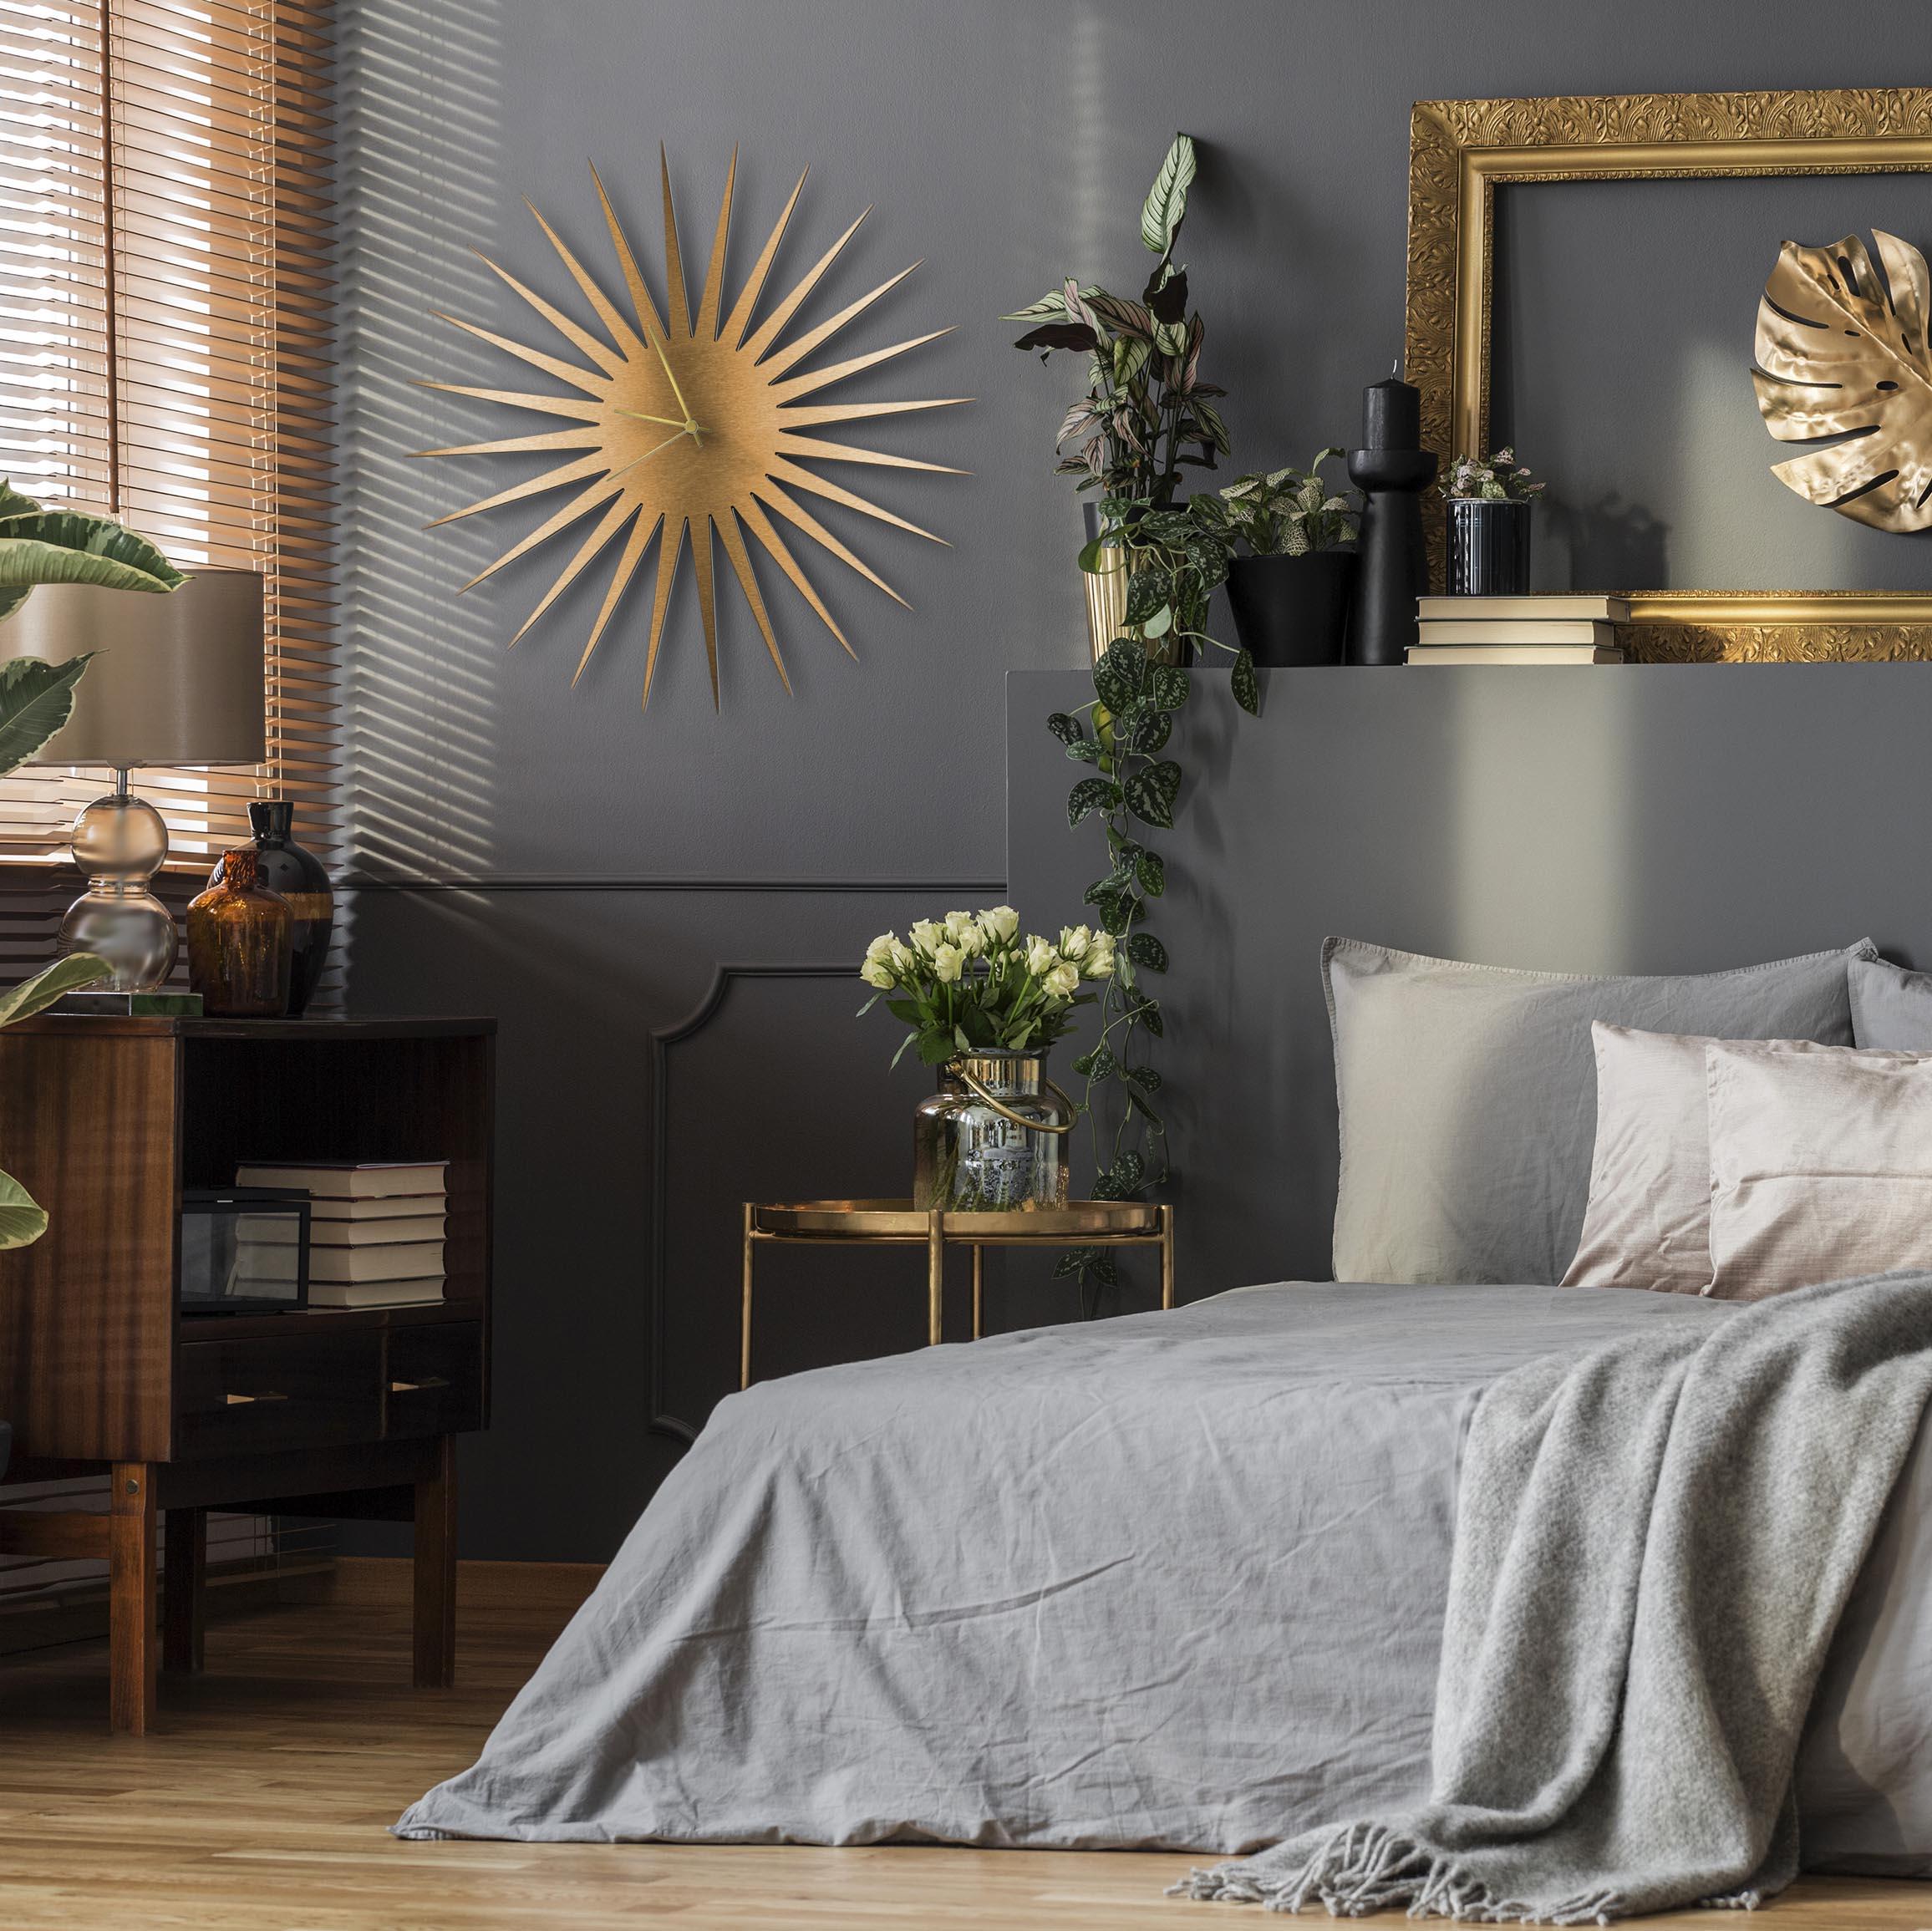 MCM Starburst Clock Bronze Gold - Lifestyle View